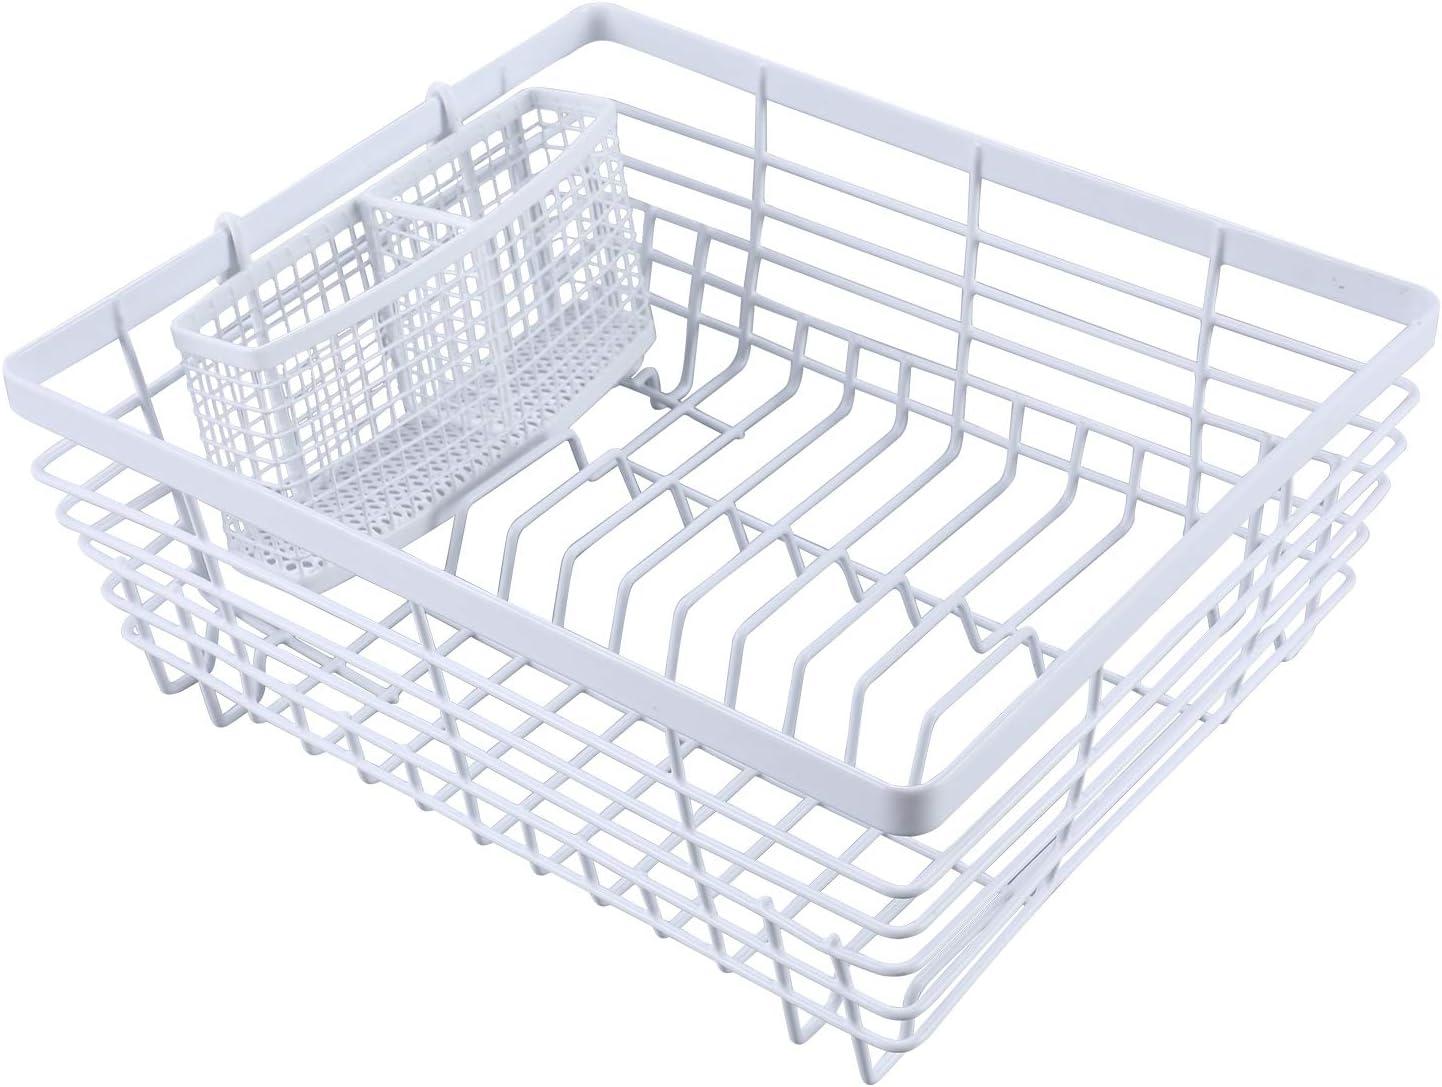 TQVAI Kitchen Dish Drying Rack with Full-Mesh Silverware Basket Holder, White